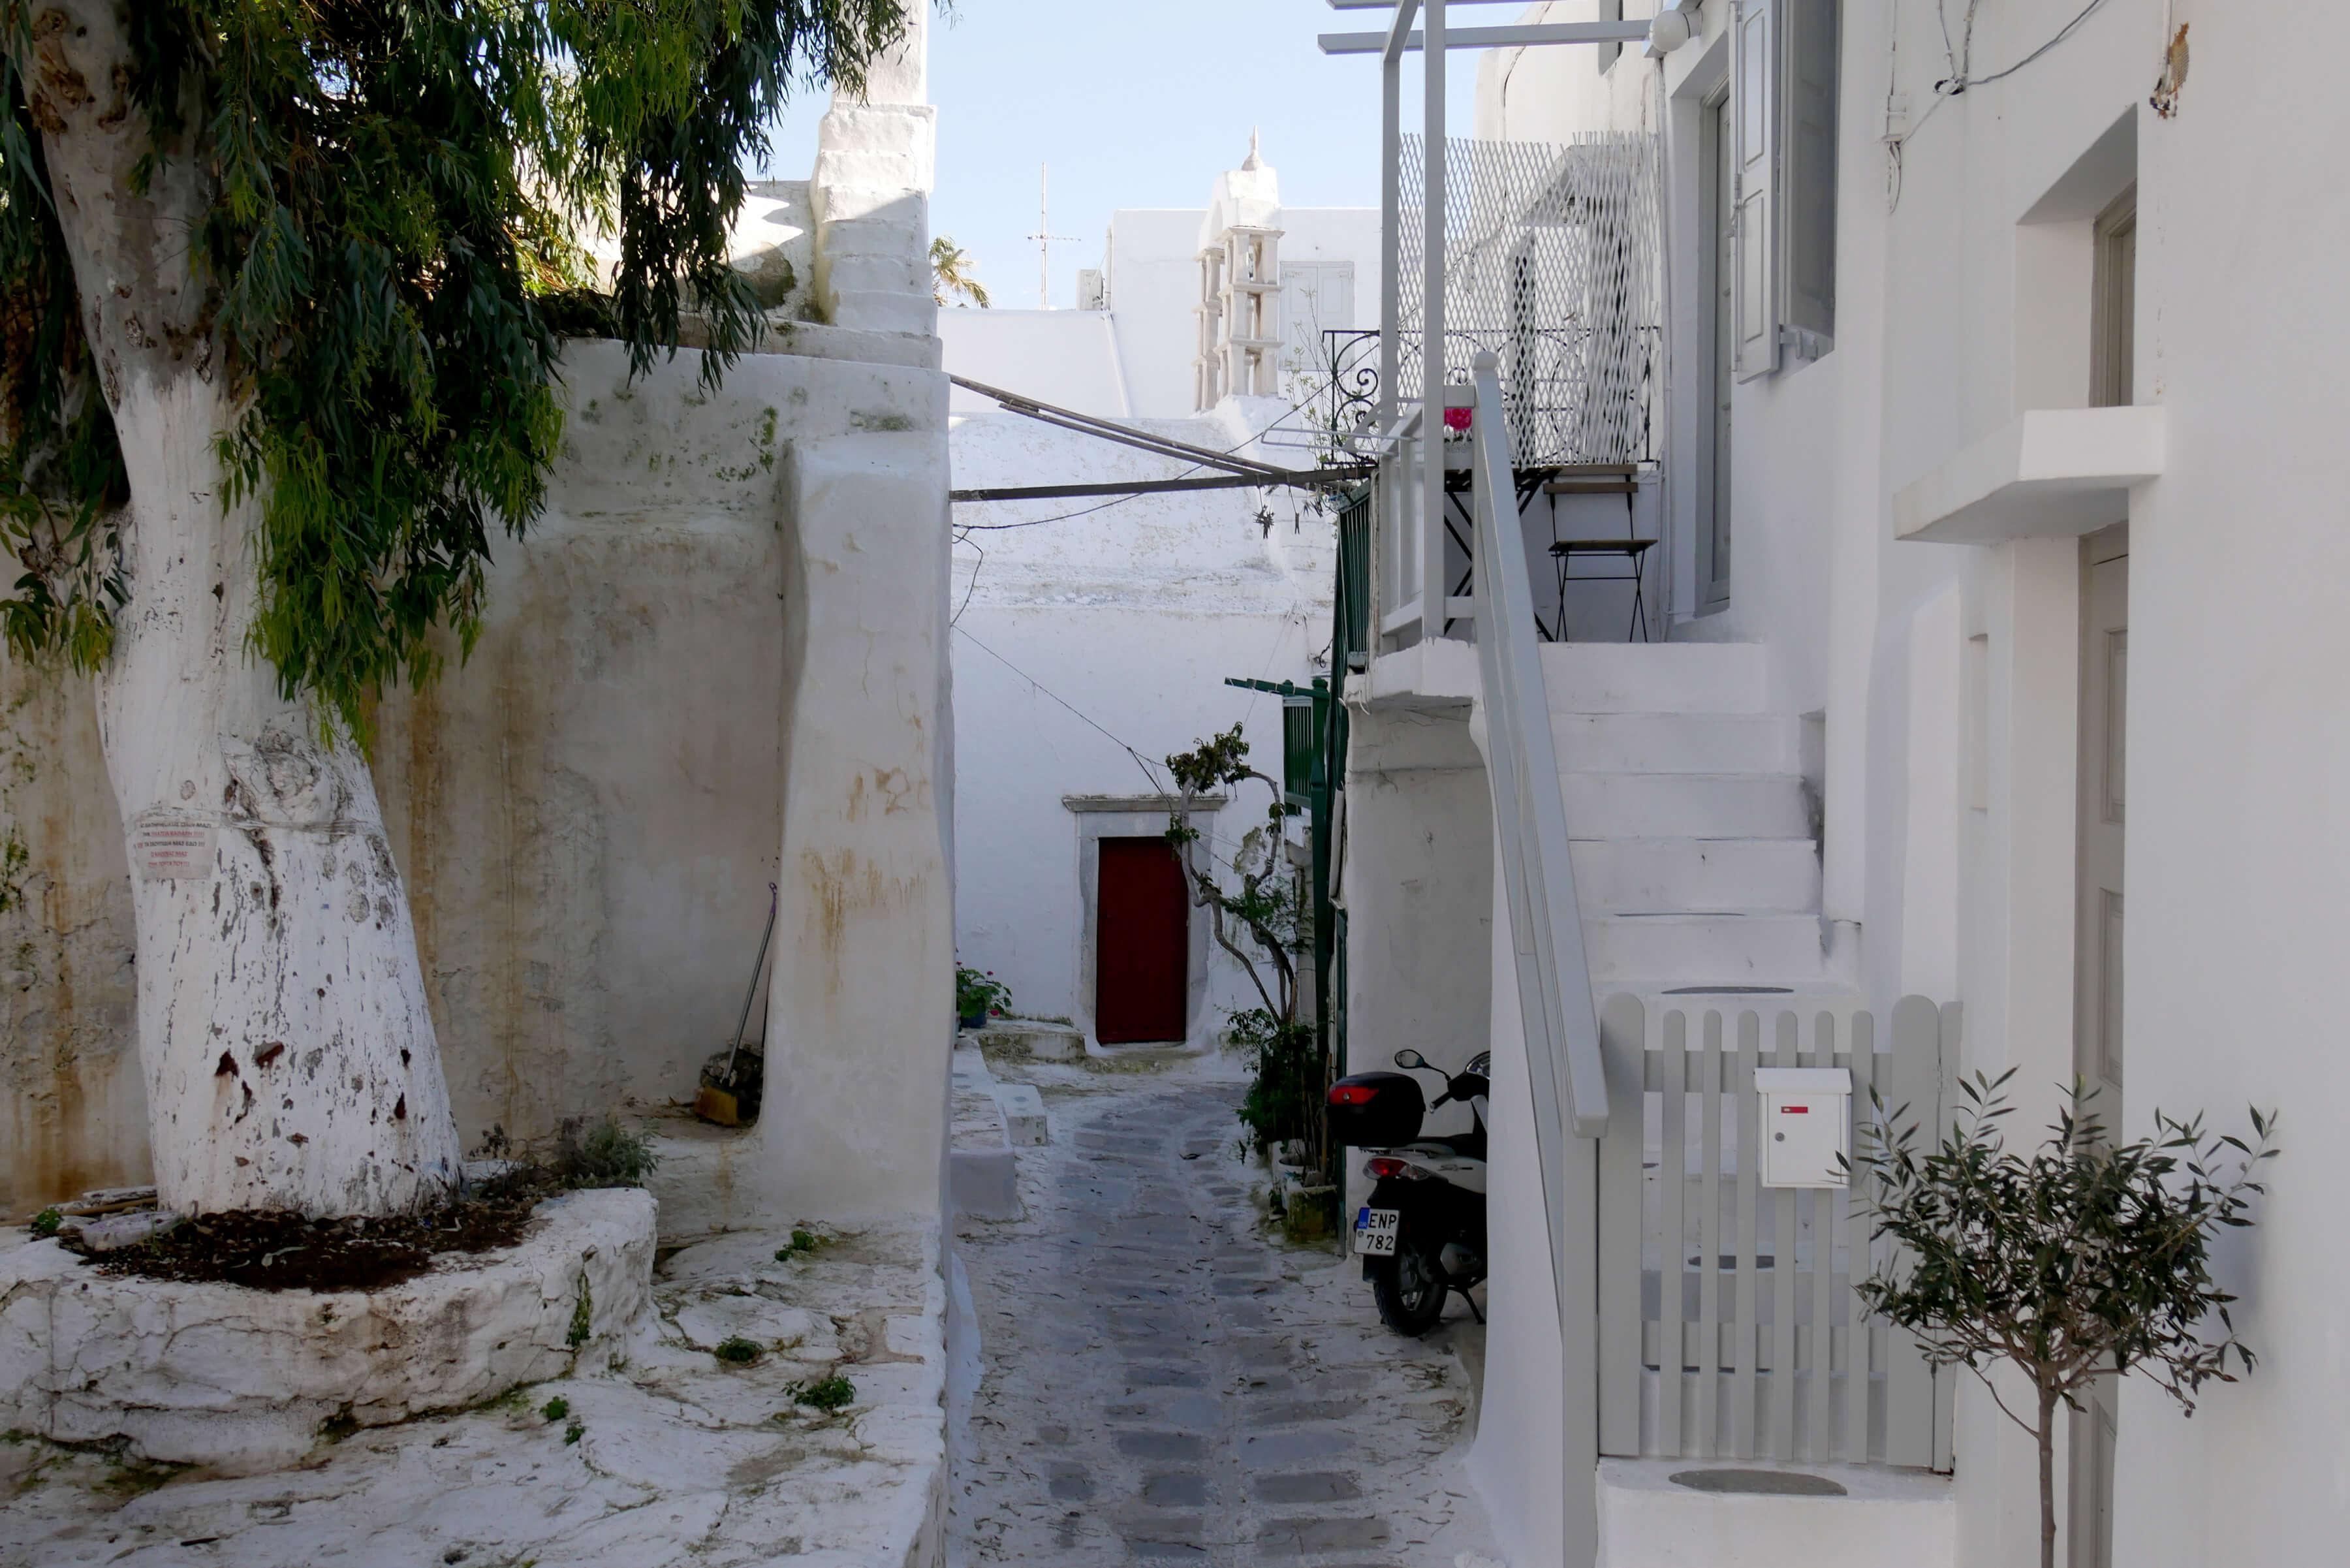 Ruelle typique des Cyclades à Mykonos